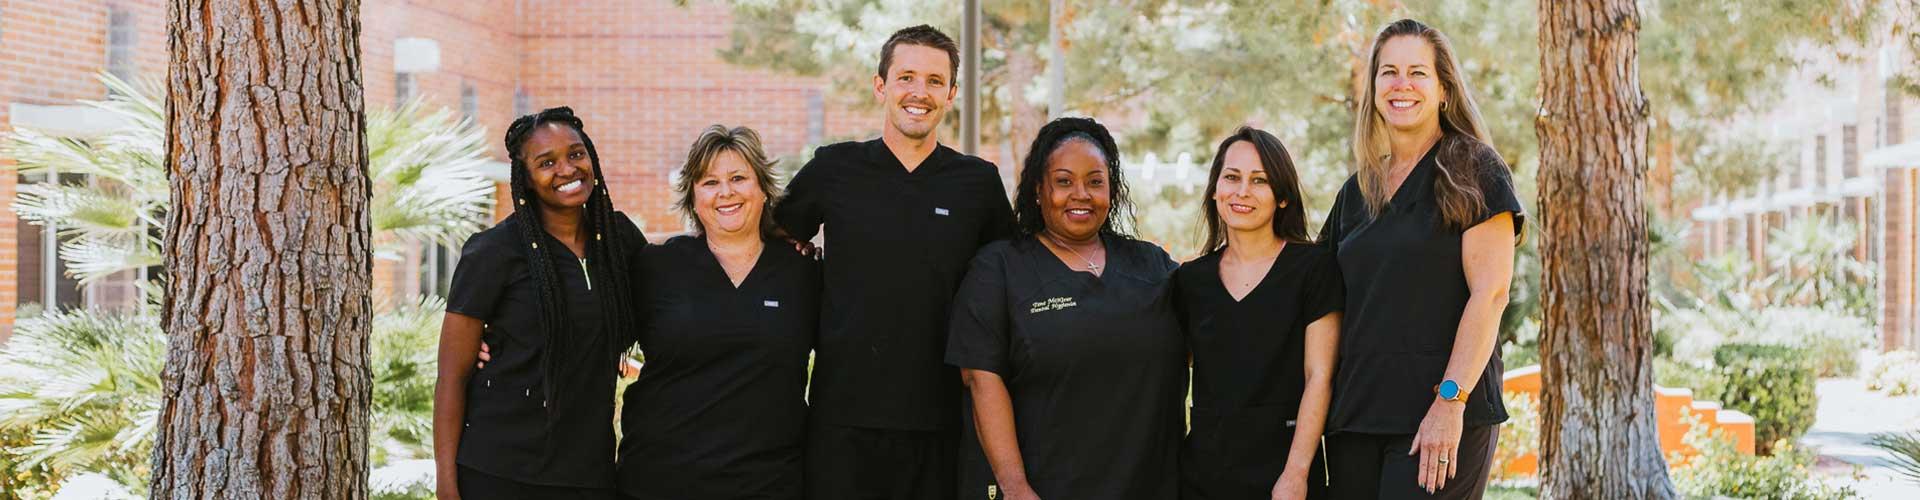 Meet the Team Header Image - Augusta Dental